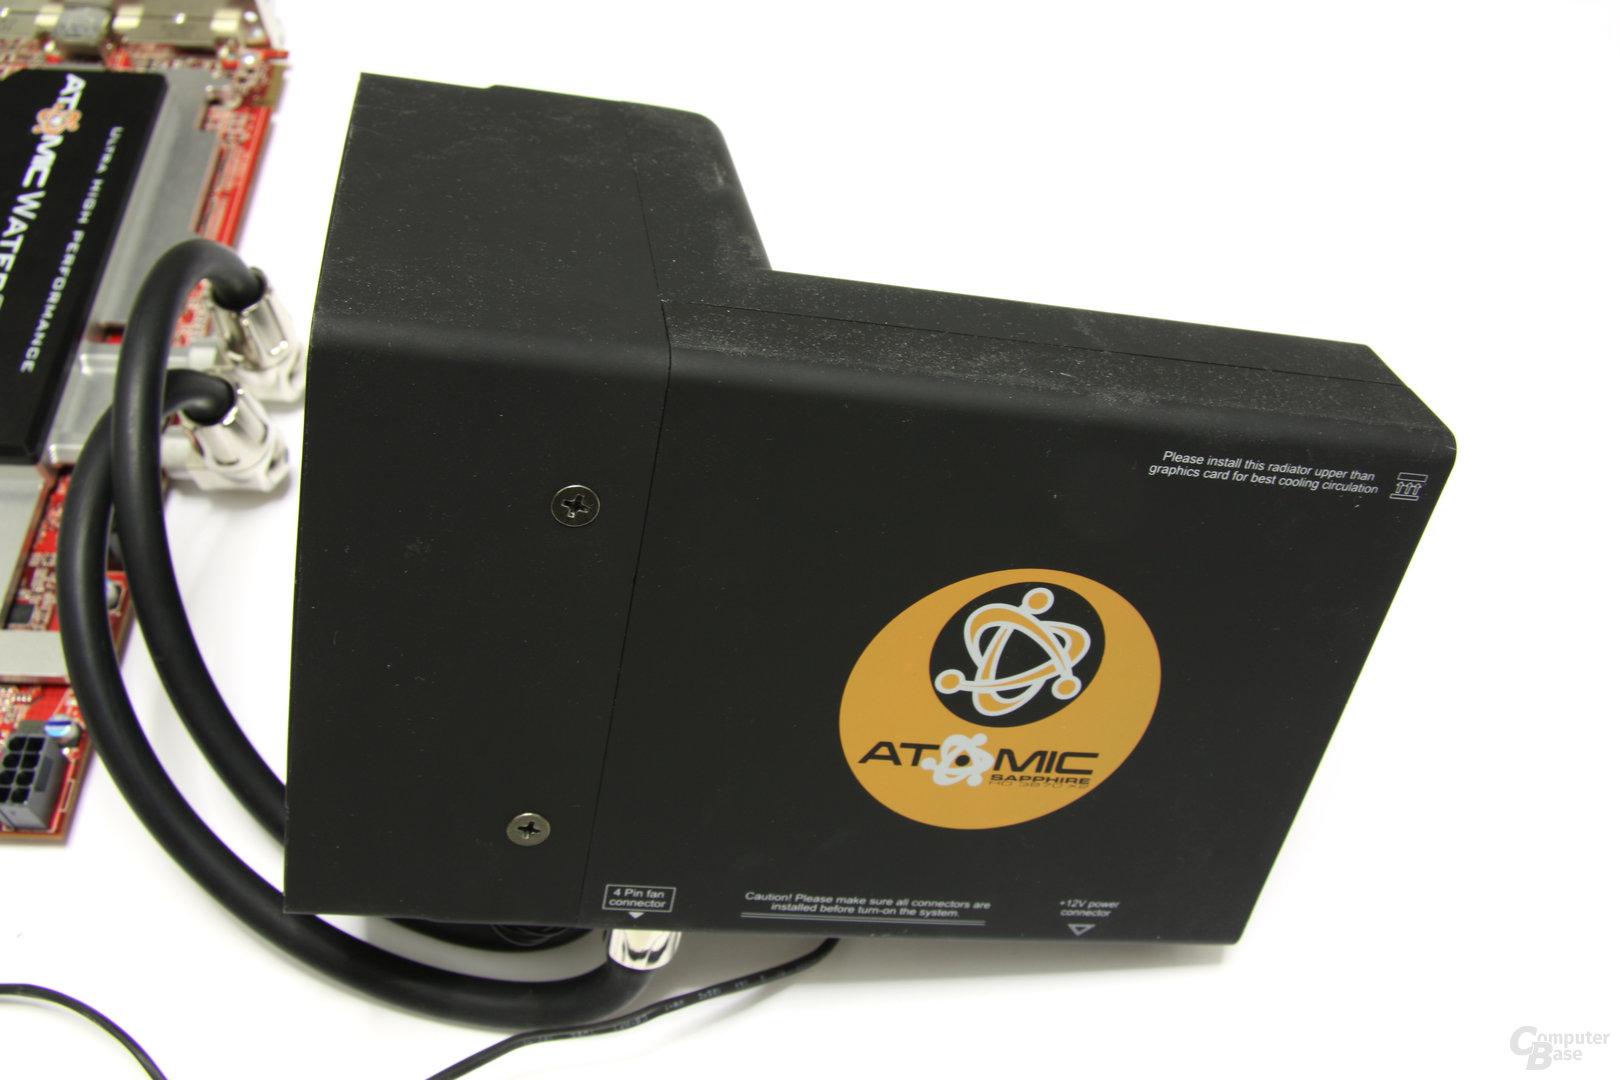 Radeon HD 3870 X2 Atomic Radiator